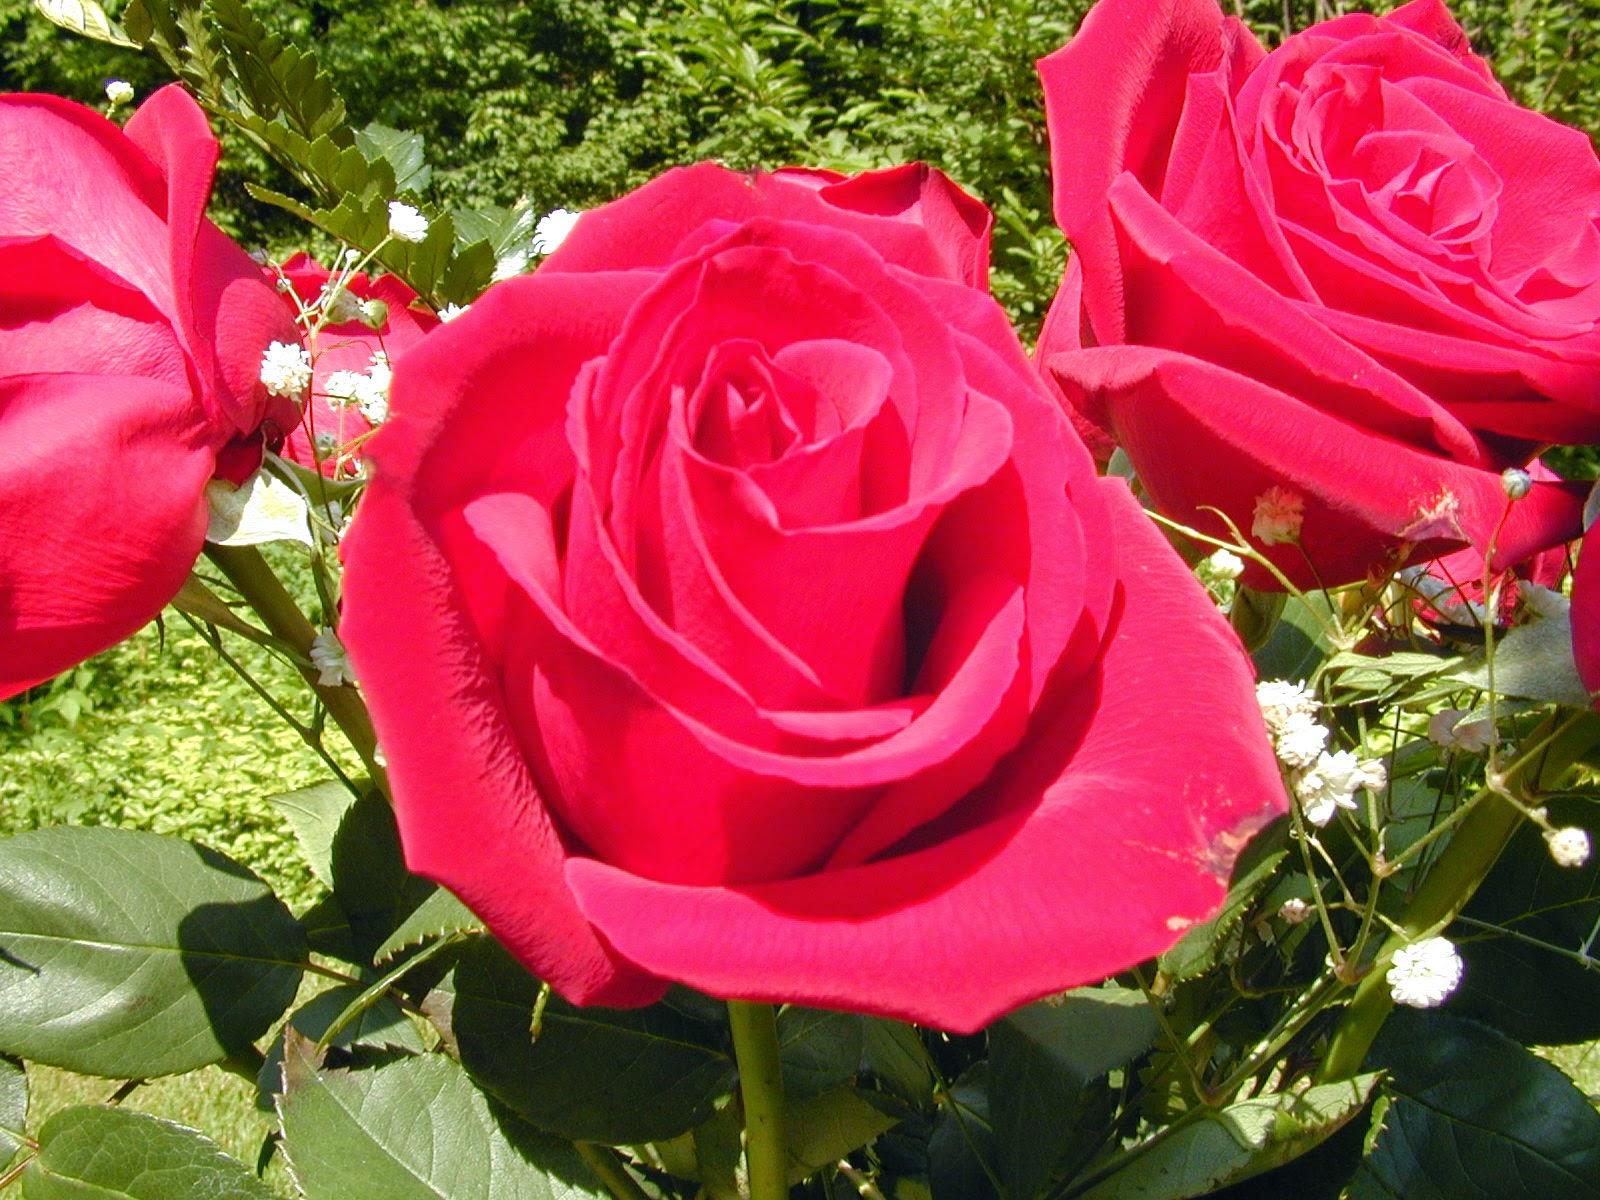 Best Wallpaper: Beautiful Flowers Hd Wallpapers Free Download